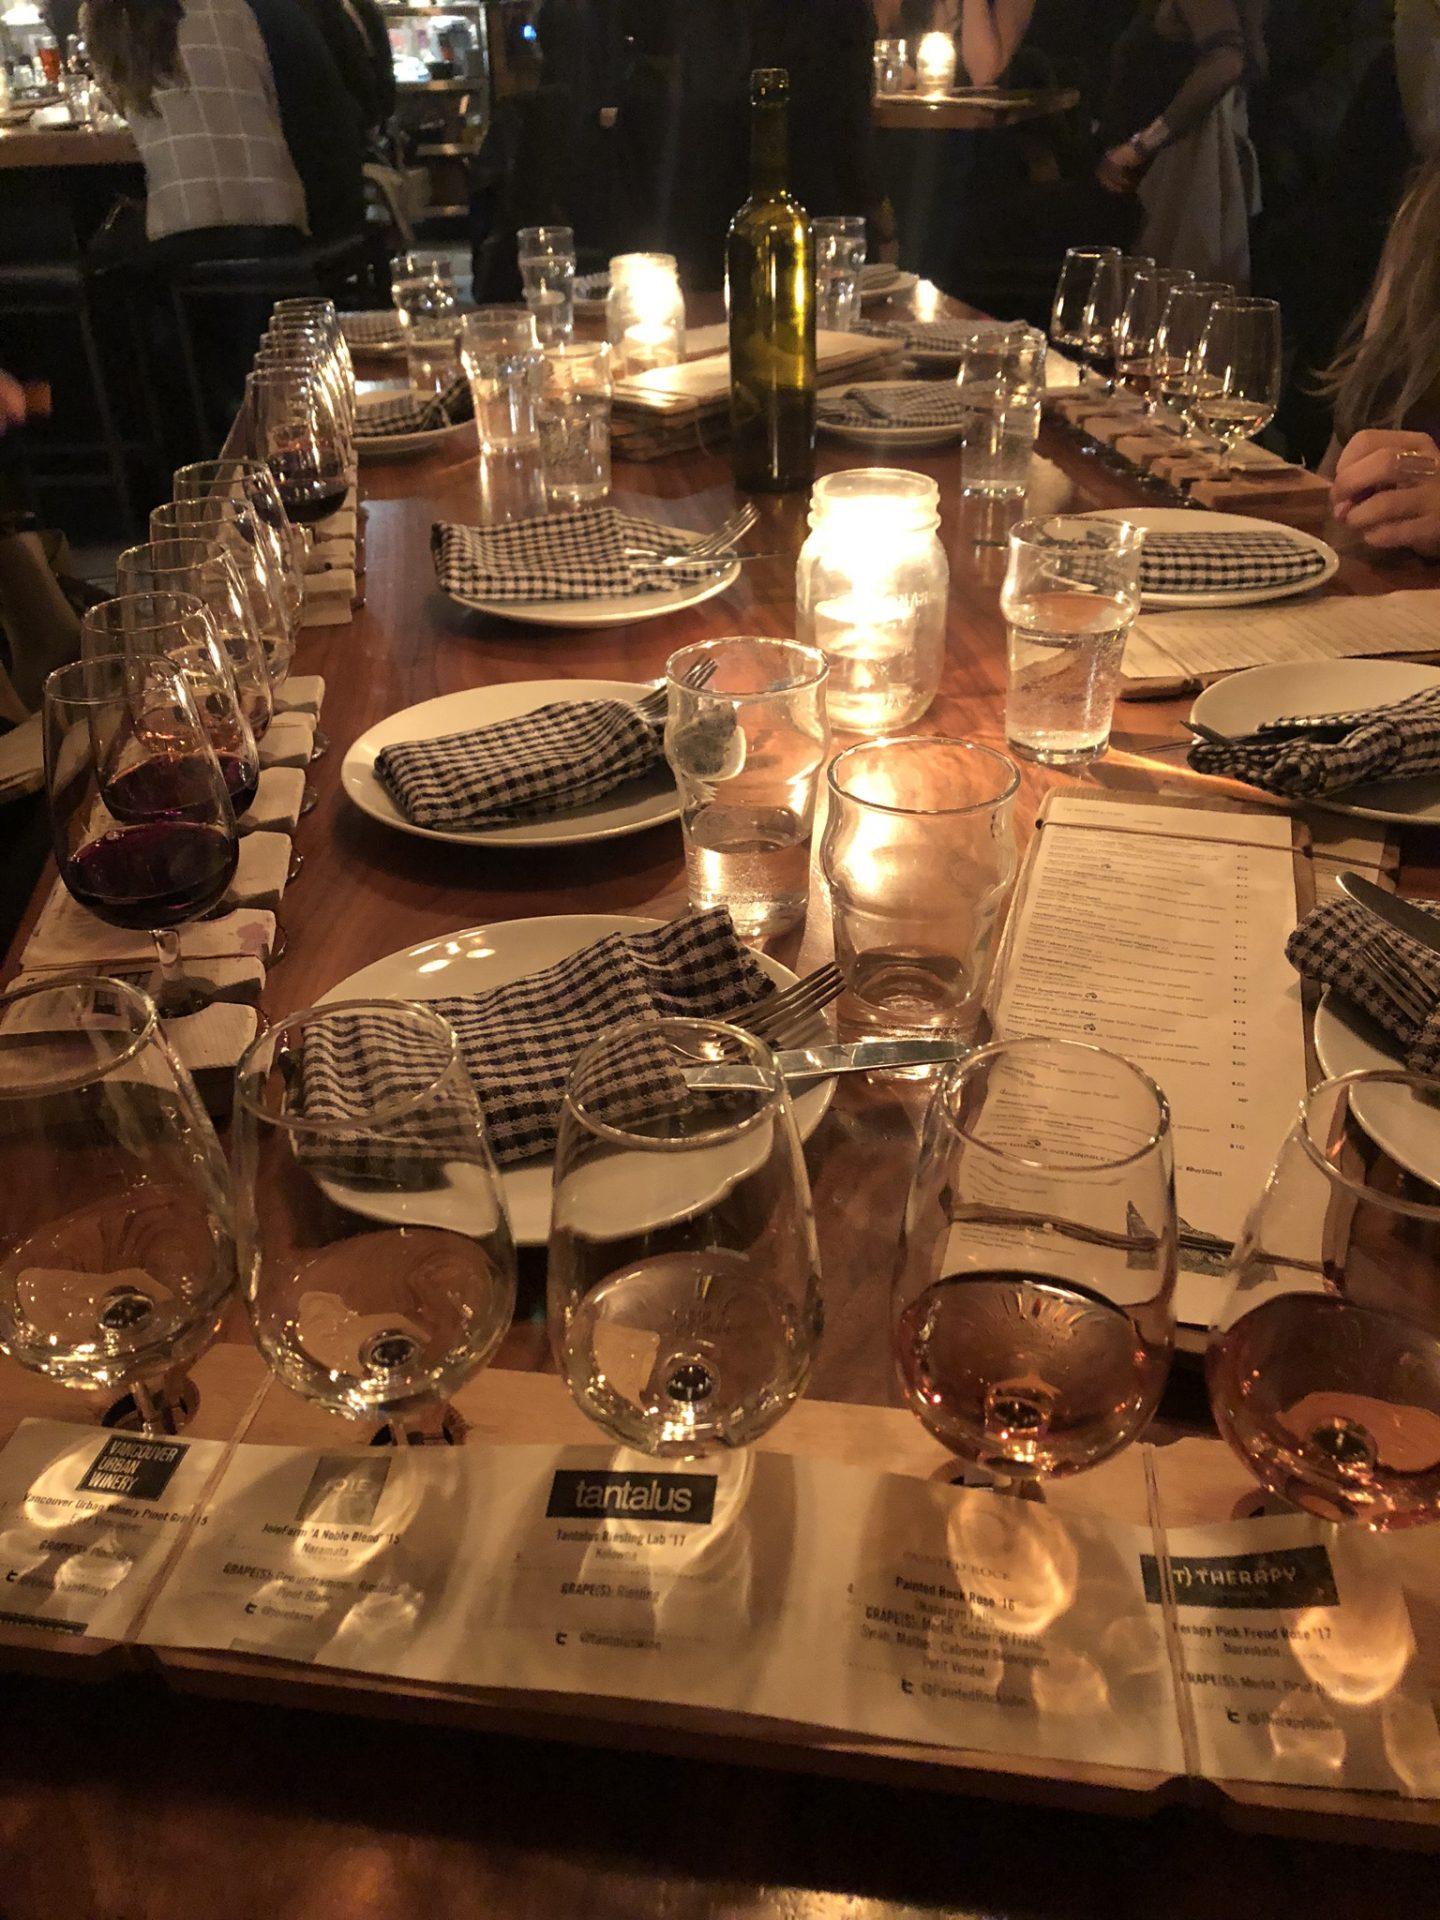 Belgard Kitchen wine flights